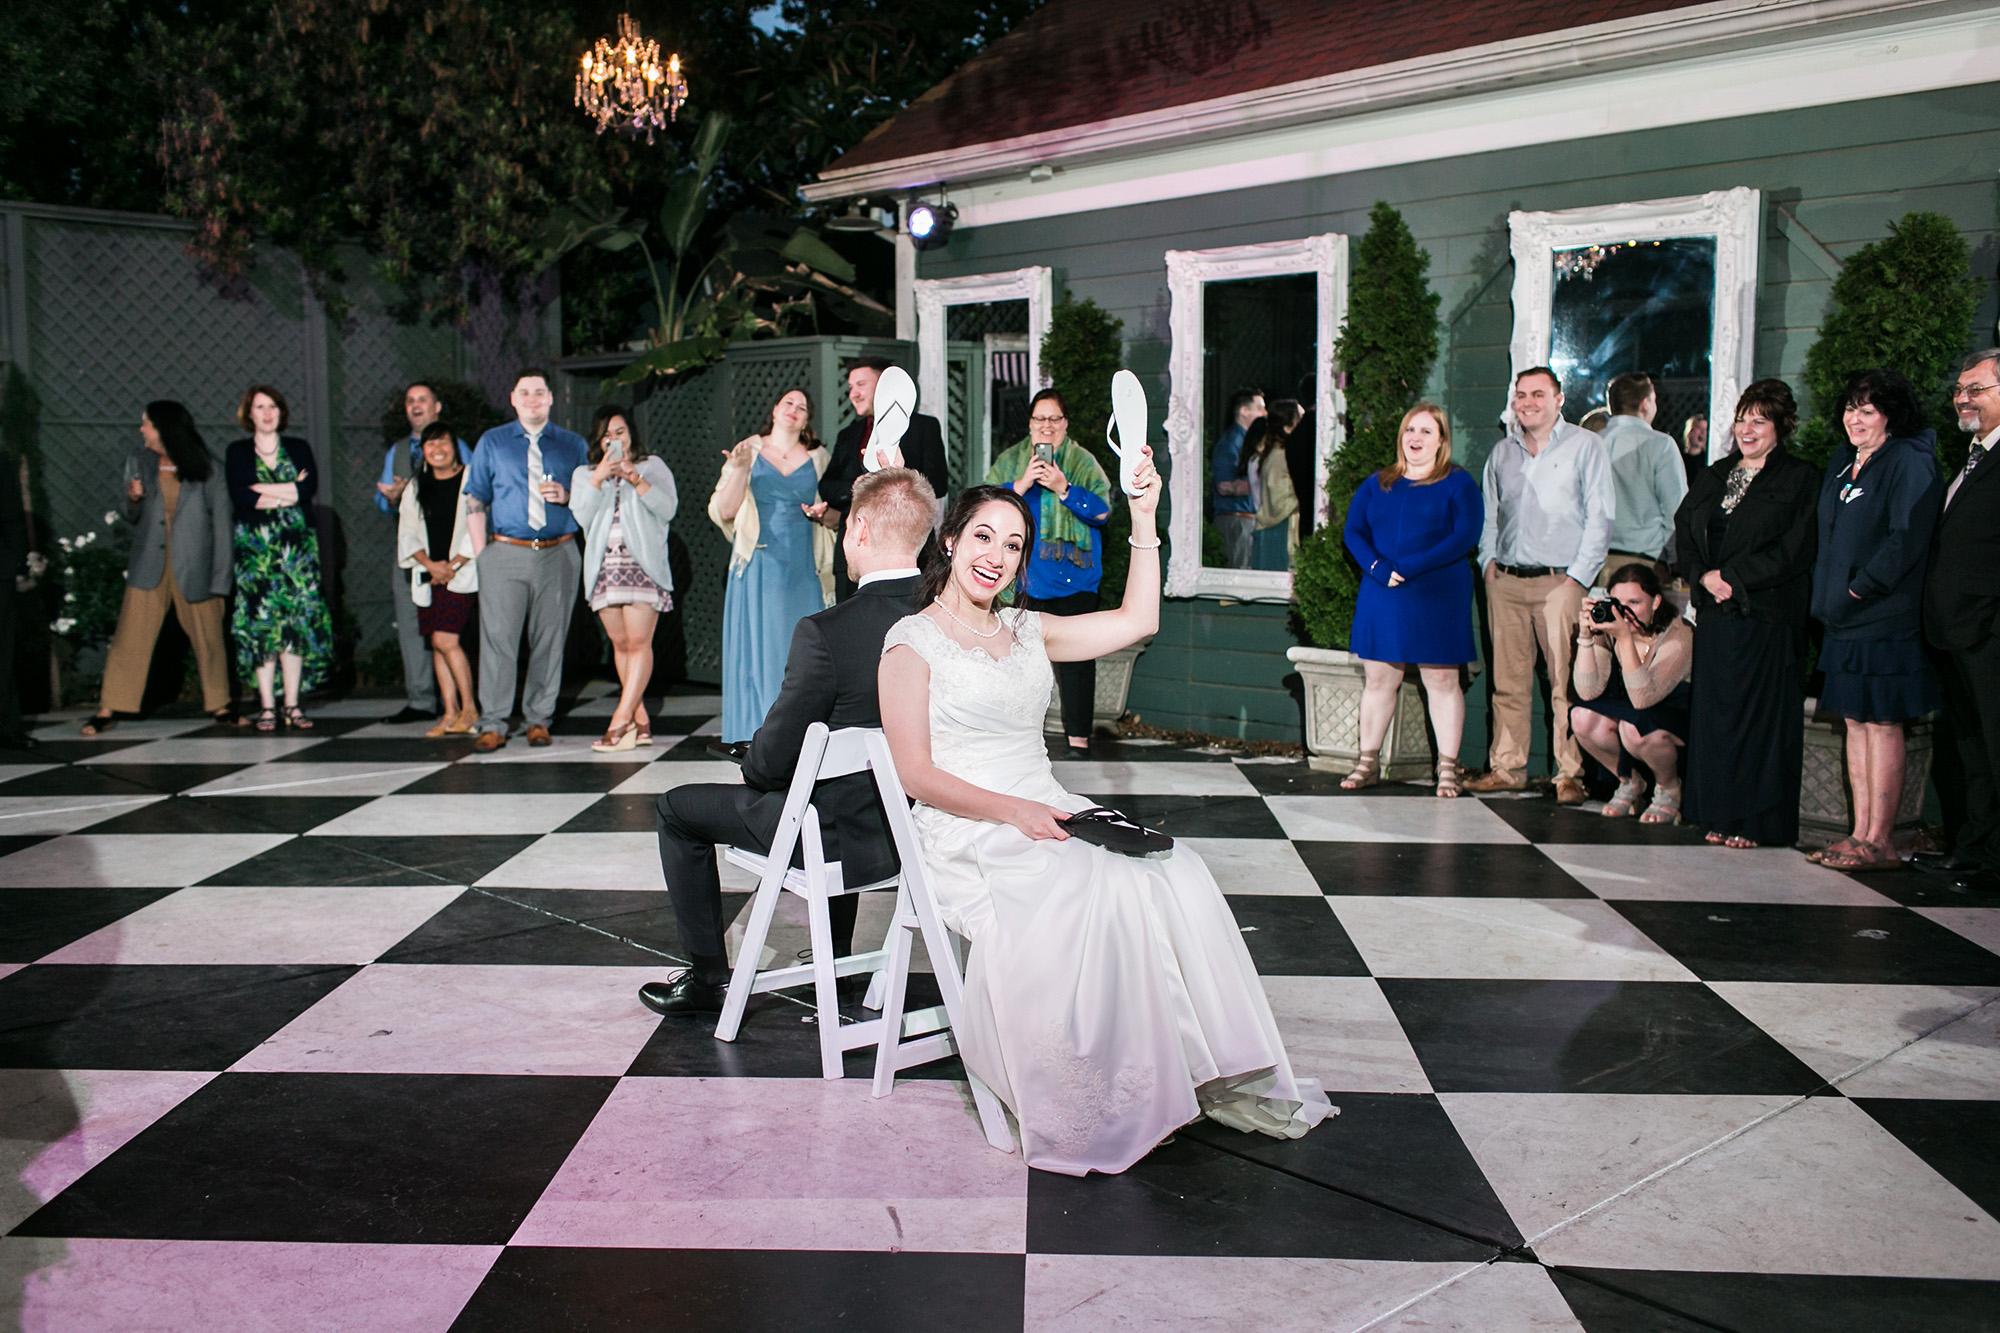 associate-photographer-christmas-house-wedding-carrie-vines-0122.jpg